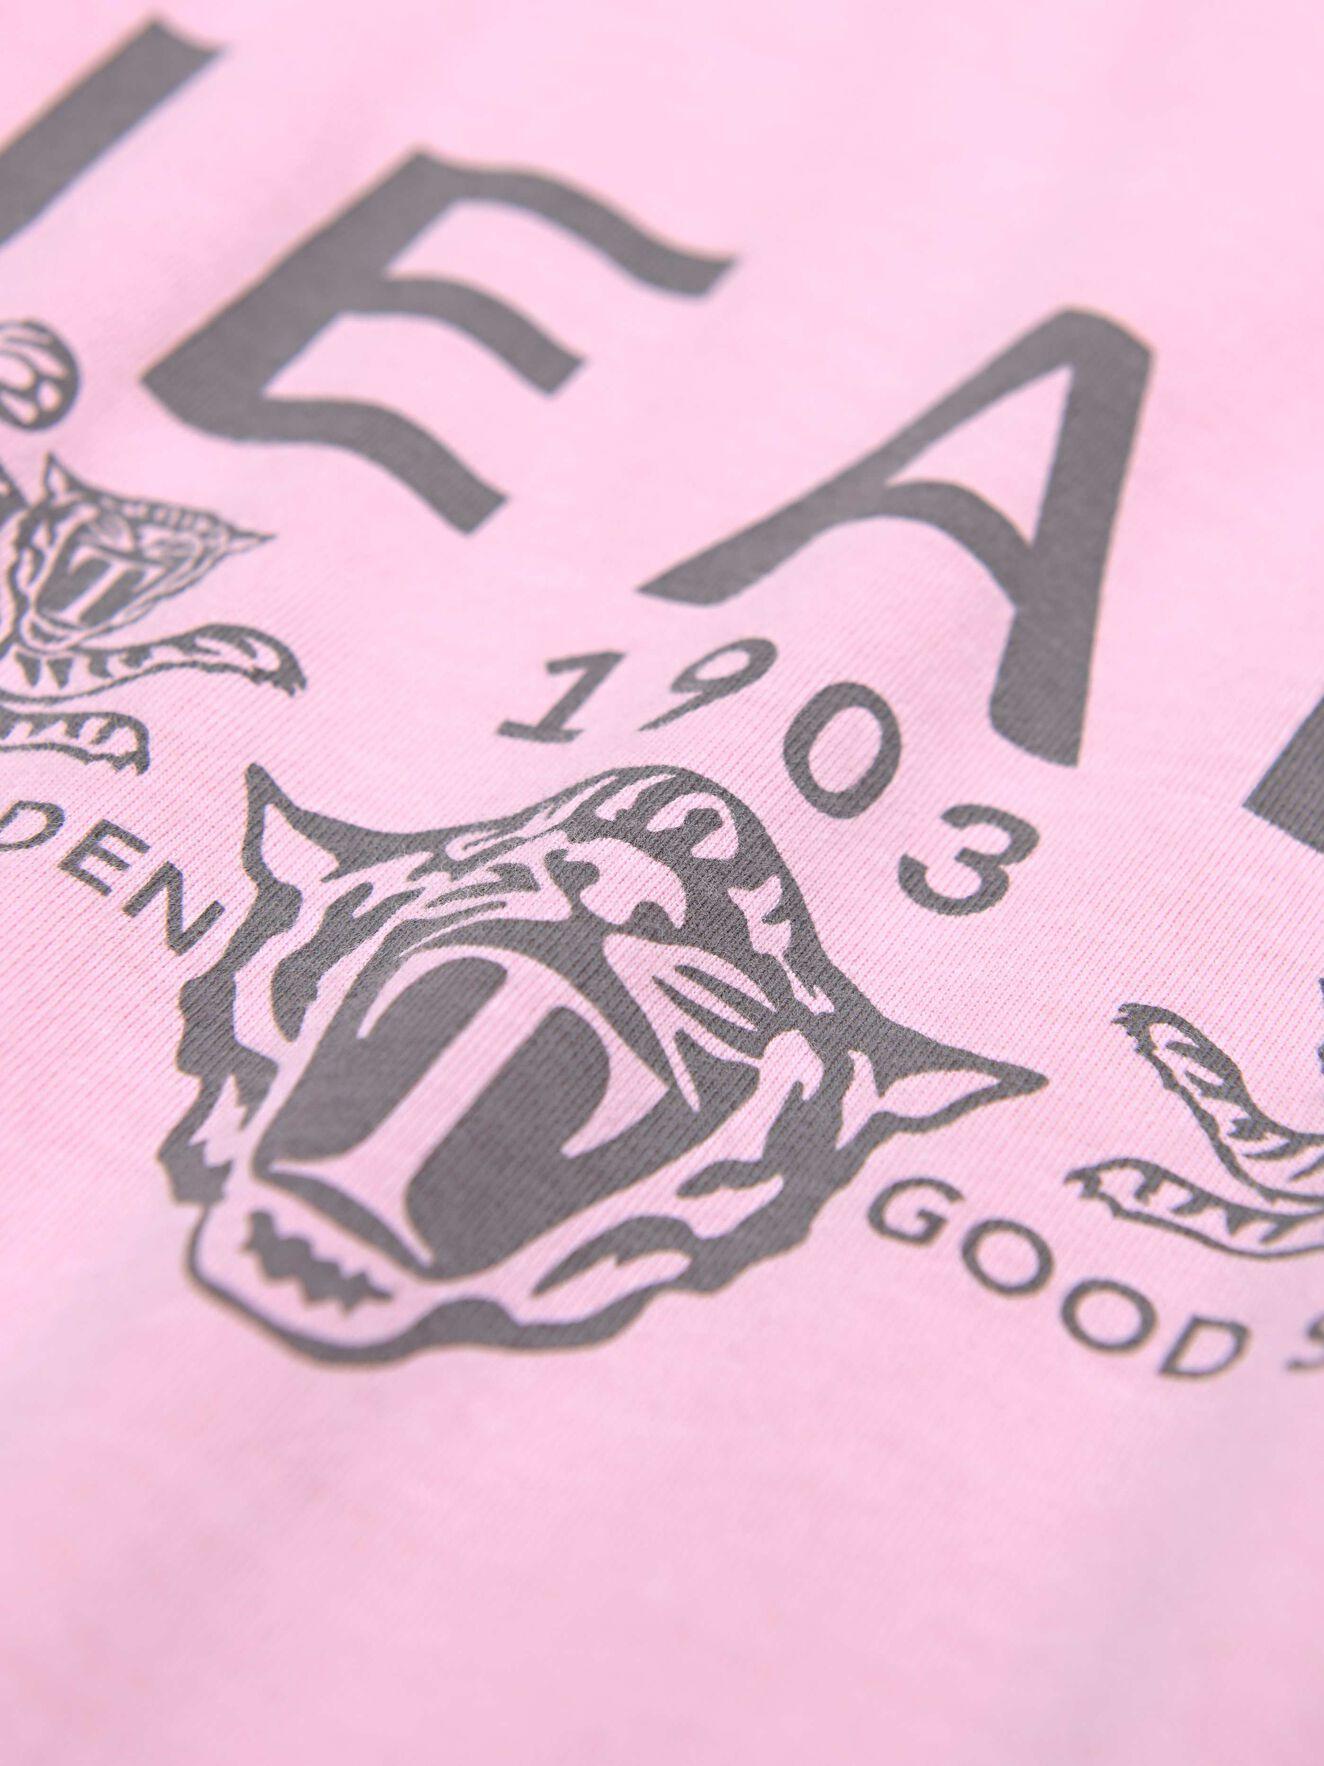 Fleek Pr t-shirt in Blush Pink from Tiger of Sweden